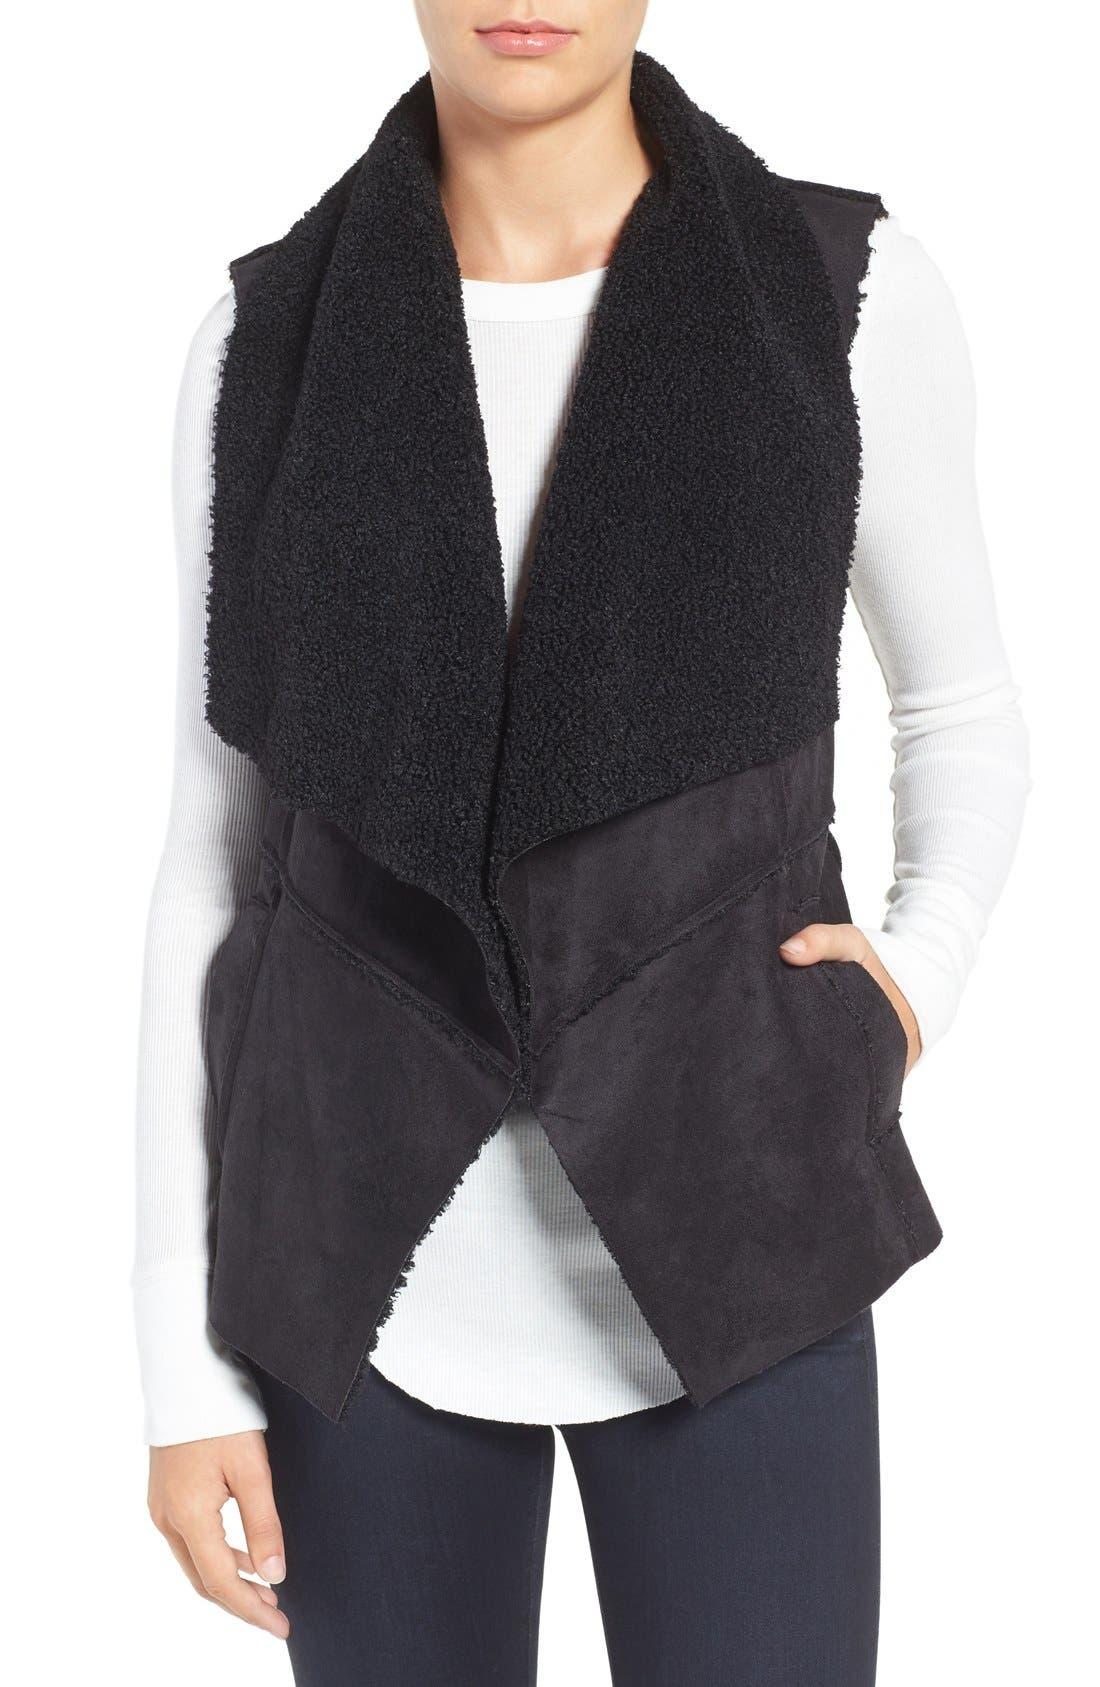 Goslett Faux Shearling Vest,                             Main thumbnail 1, color,                             001